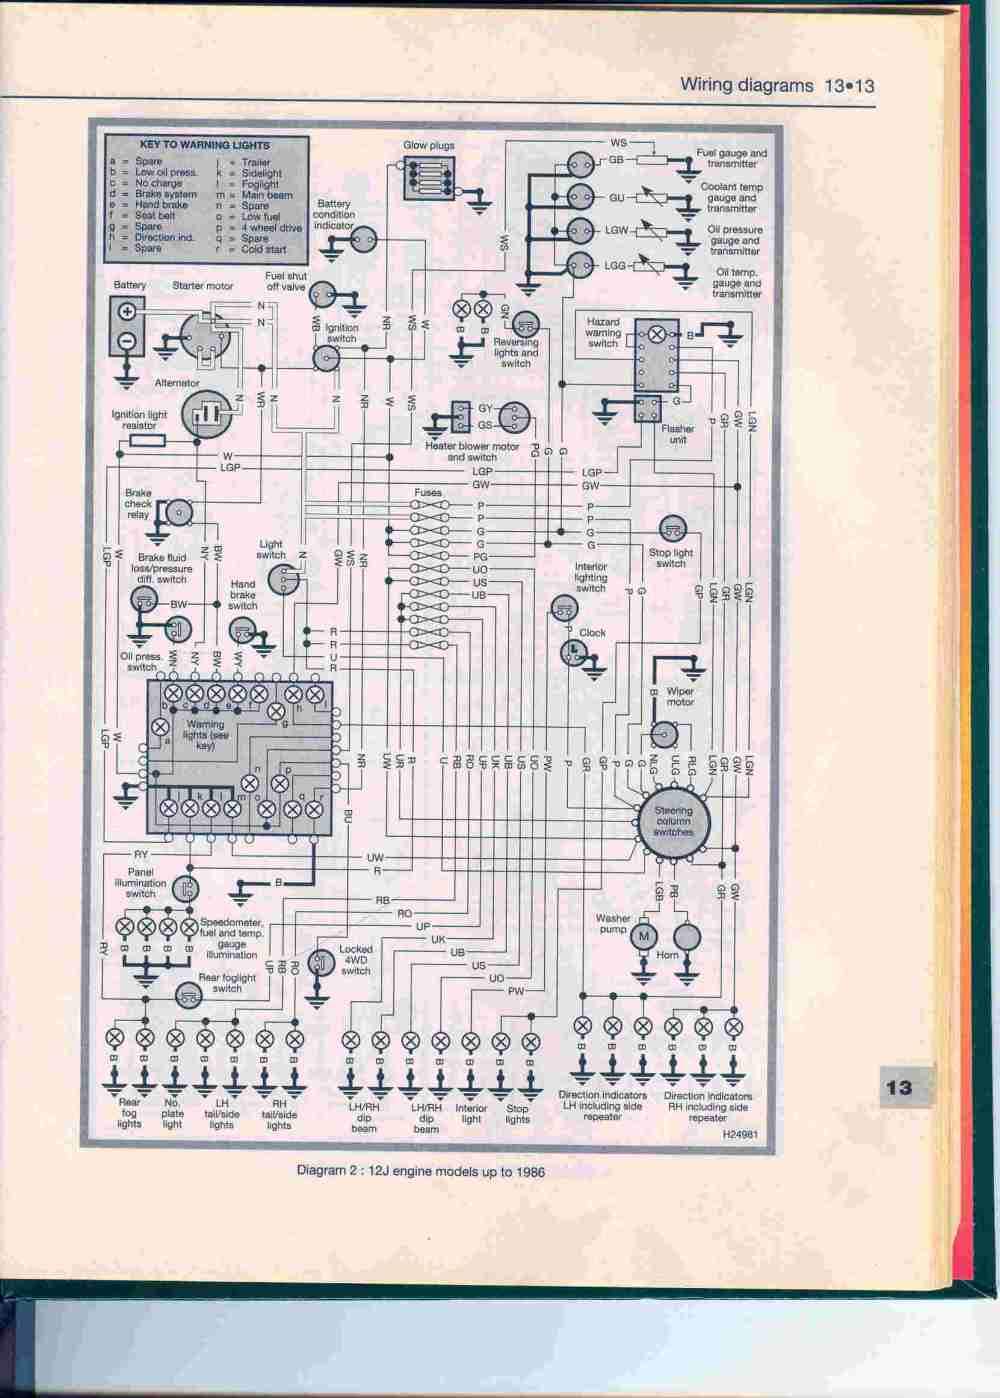 medium resolution of wiring diagram for early ish 90 defender forum lr4x4 the landpost 17 127348076003 thumb jpg